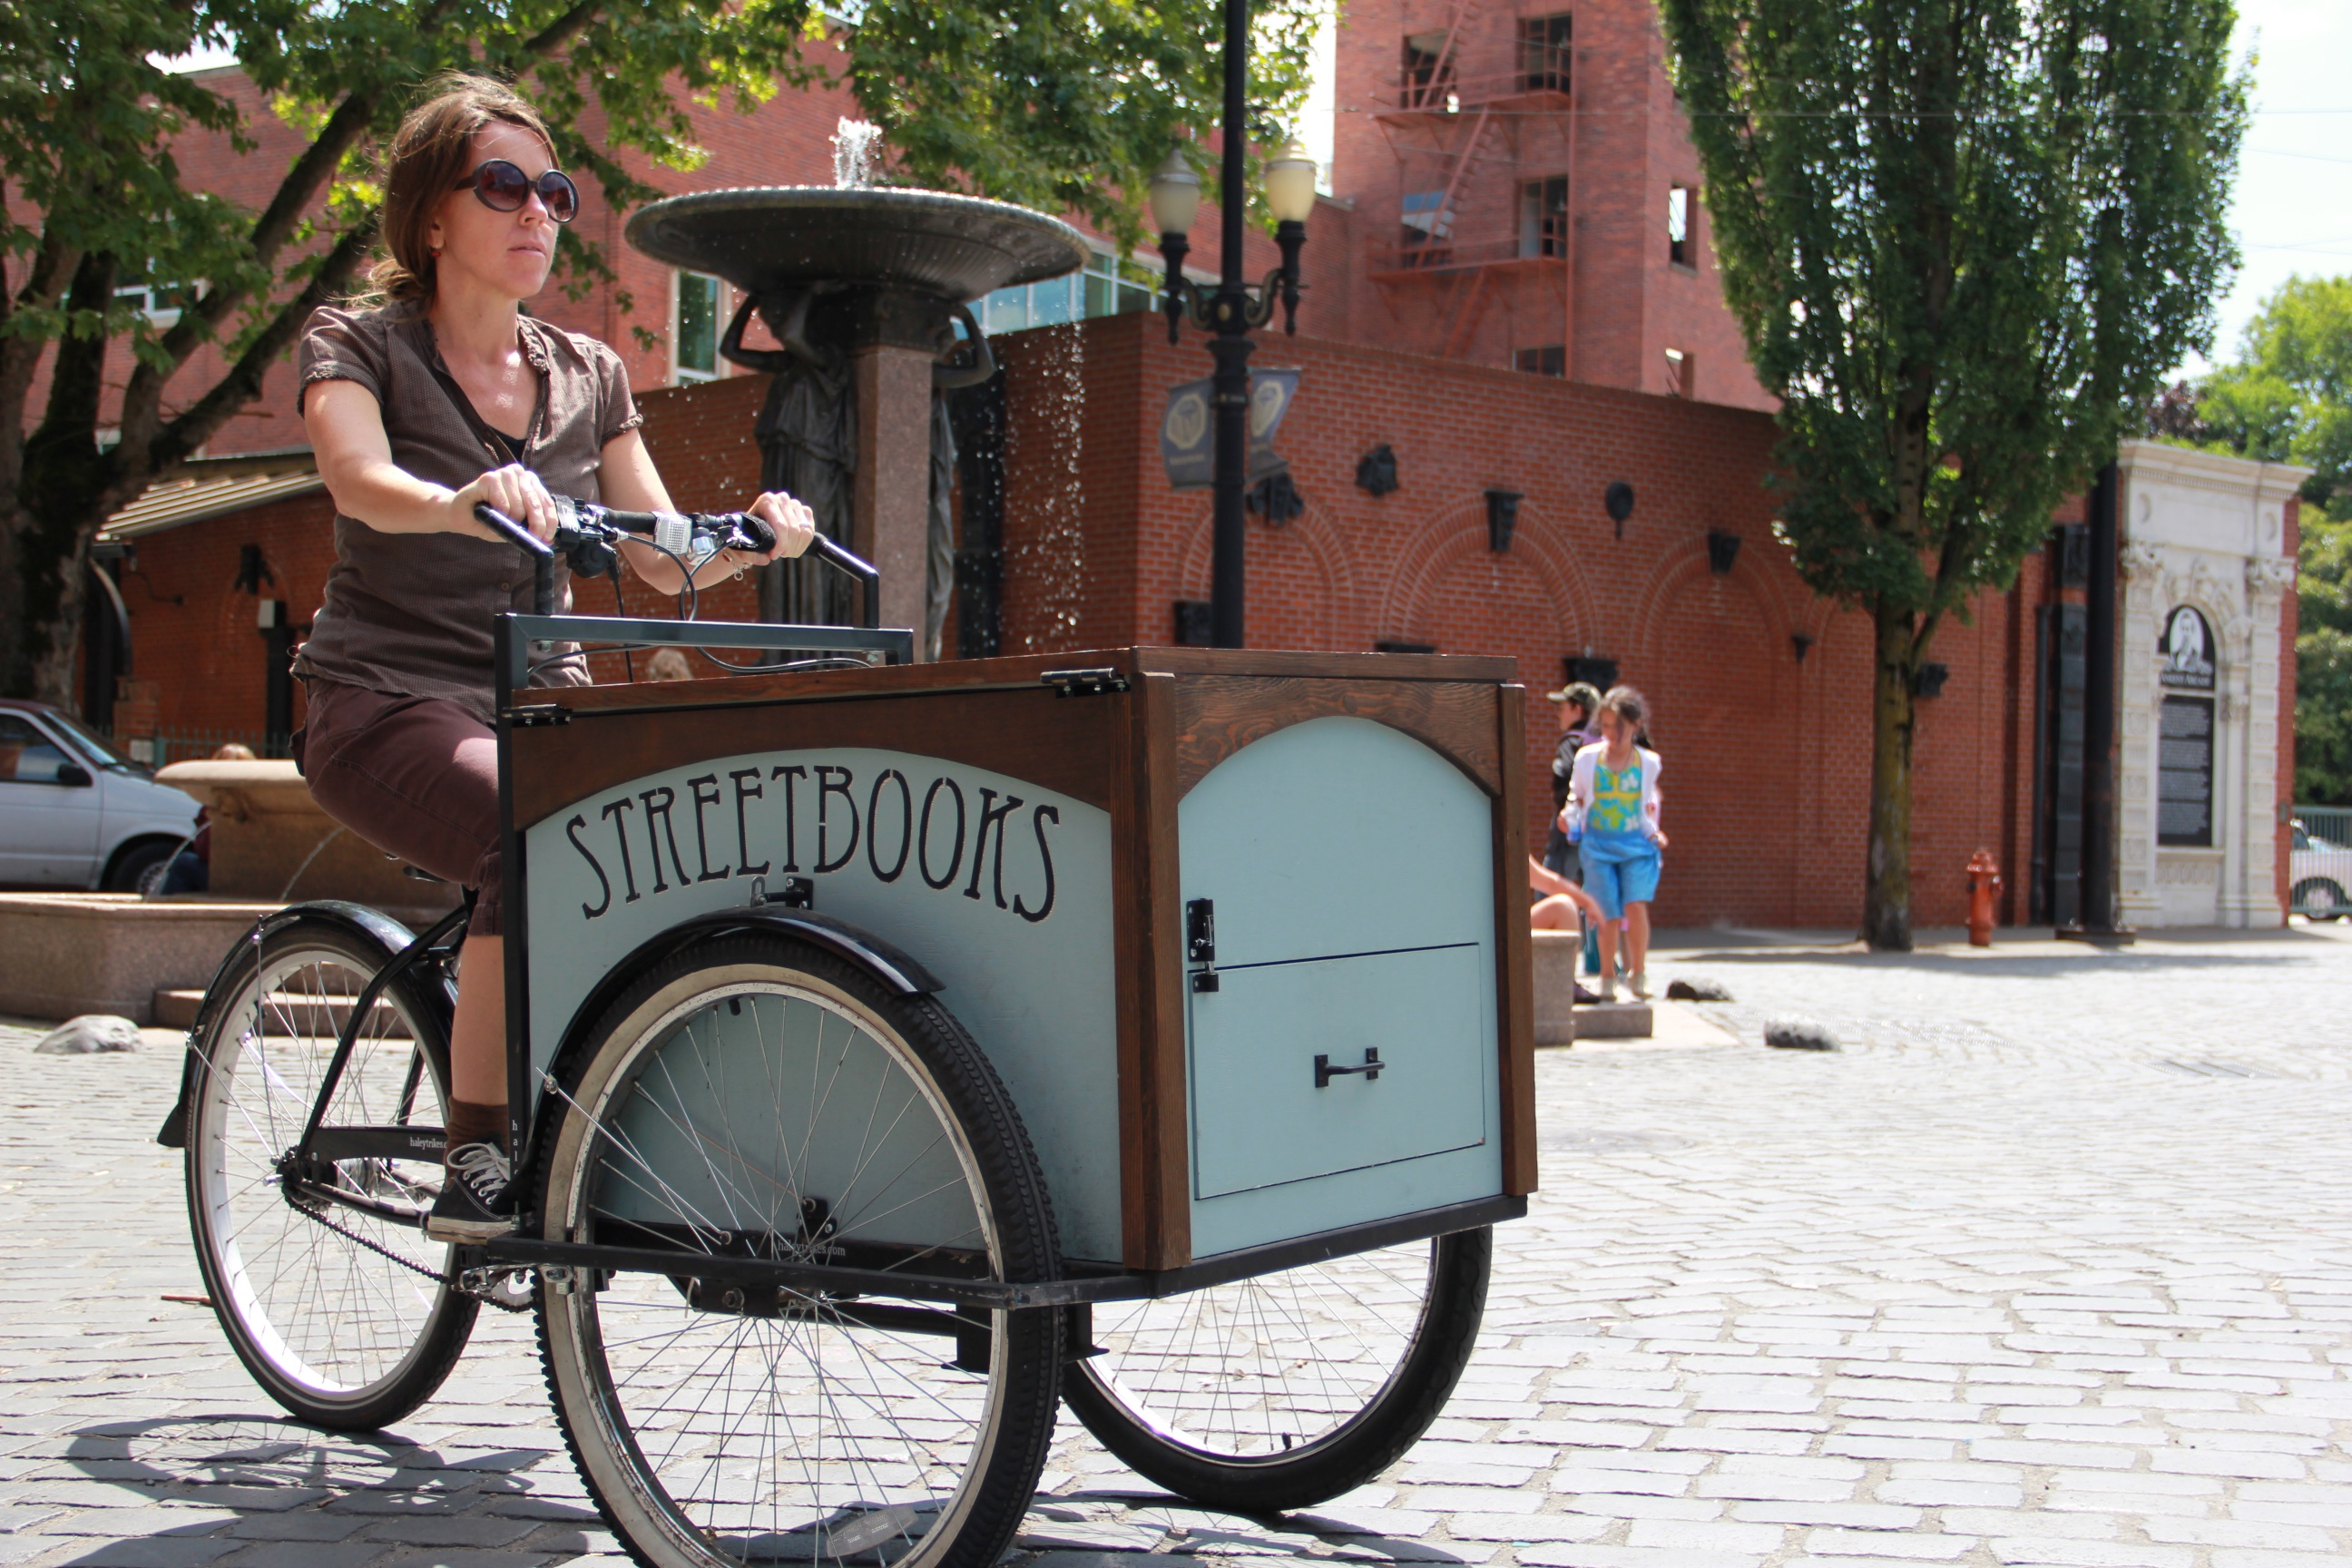 streetbook